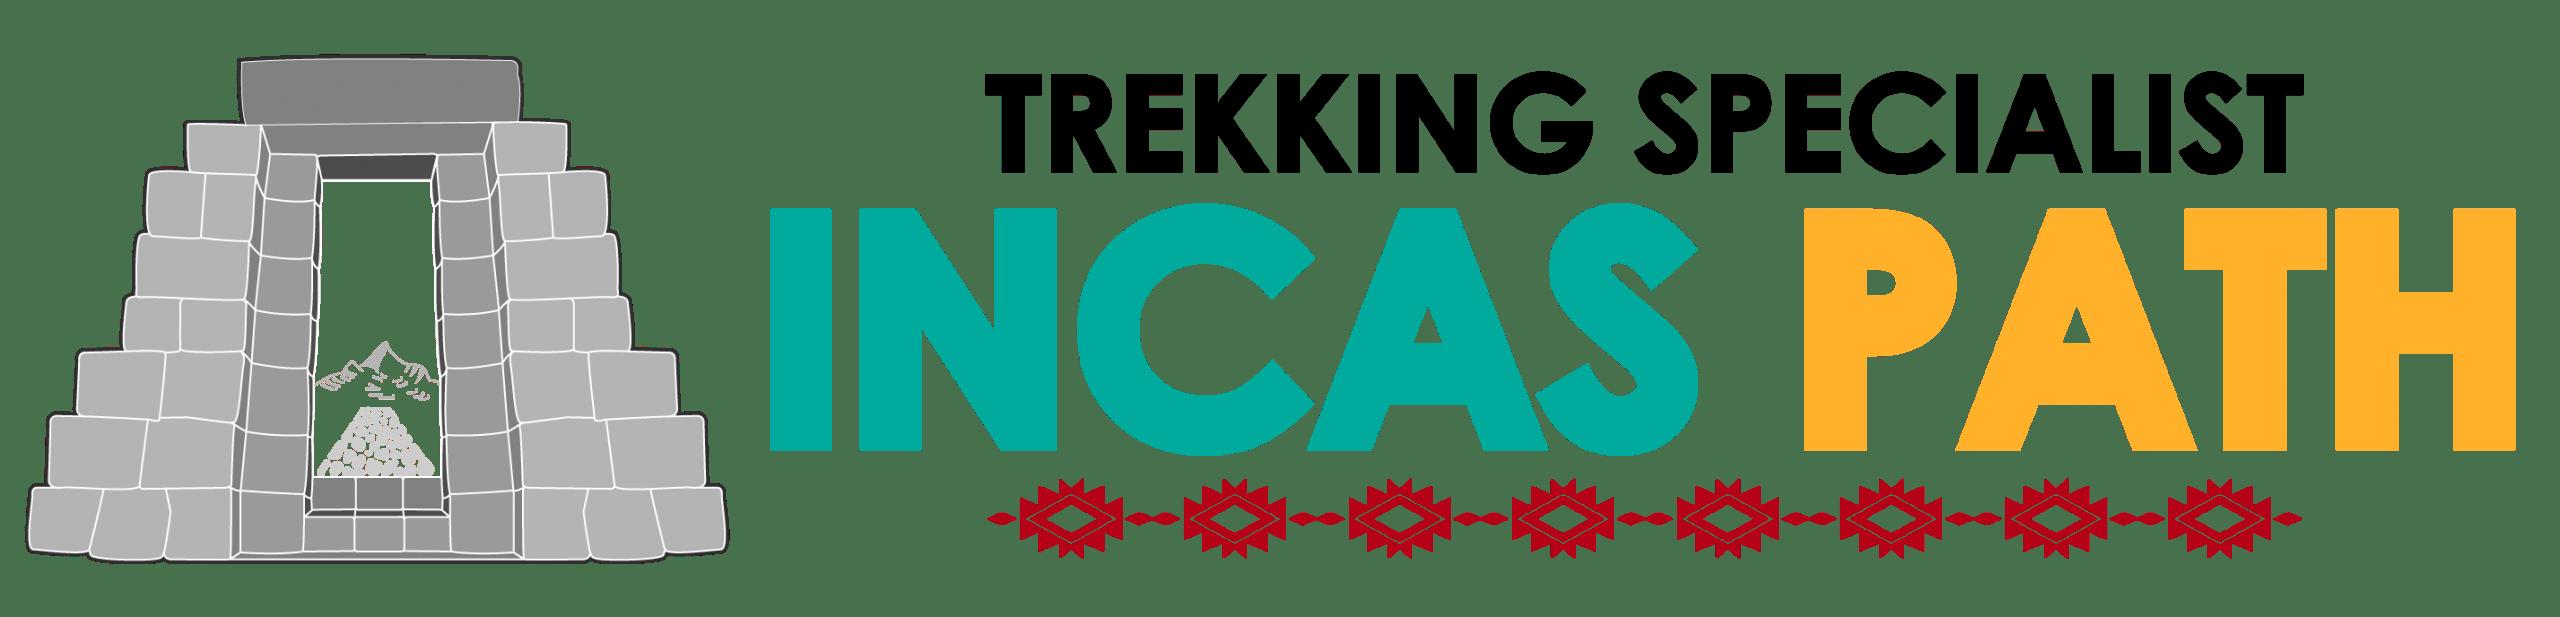 Incas Path trekking specialist